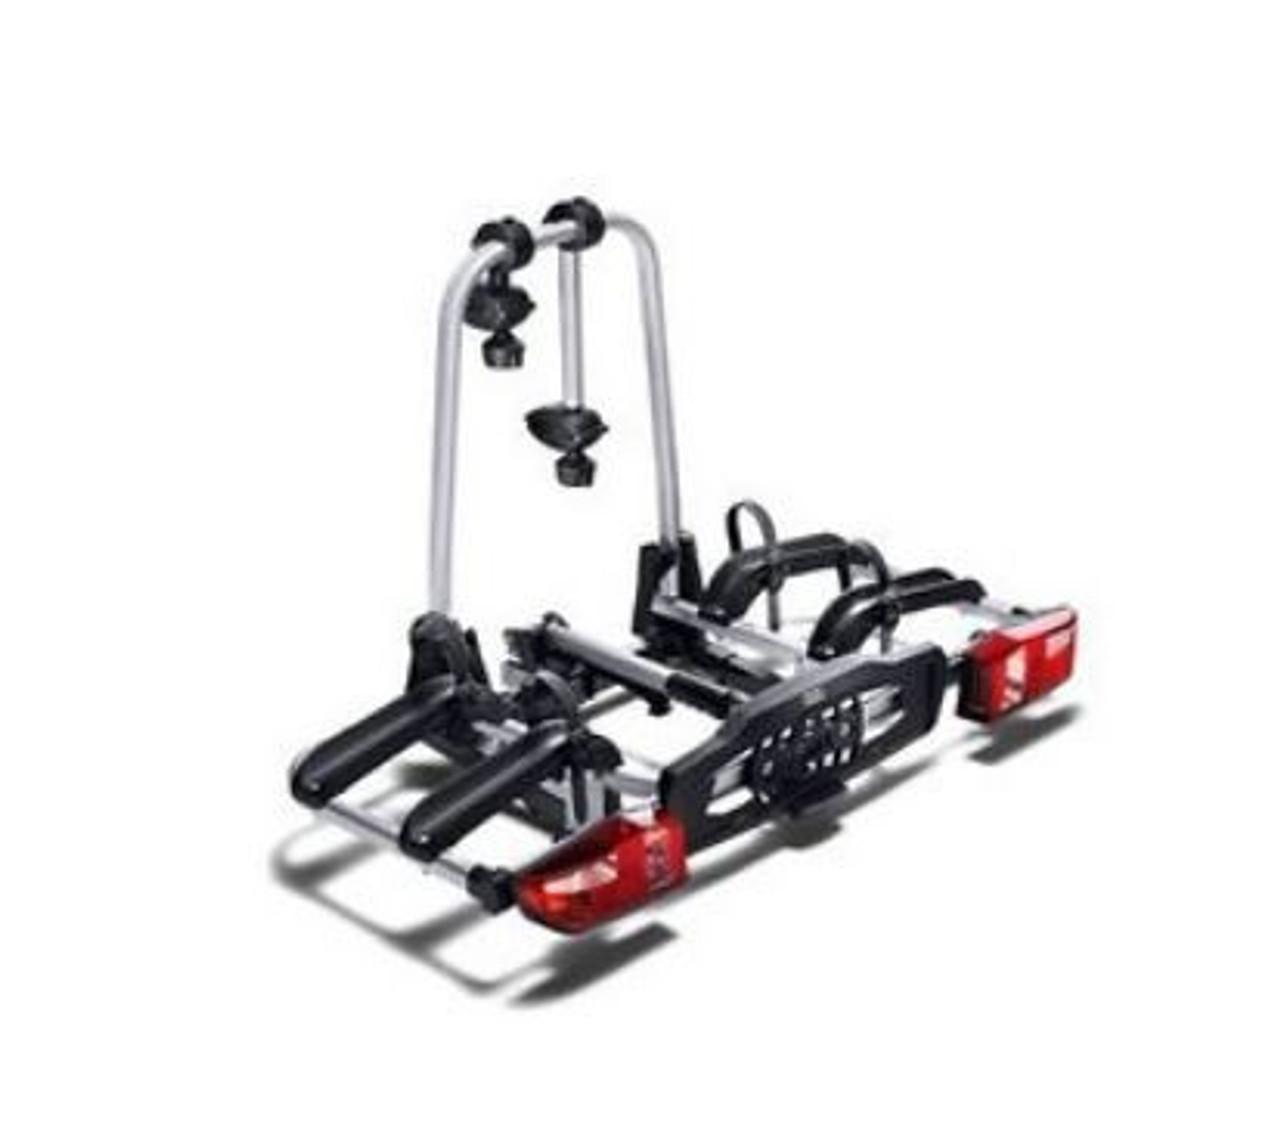 Genuine Audi tow bar mounted 2 bike carrier 4K2071105